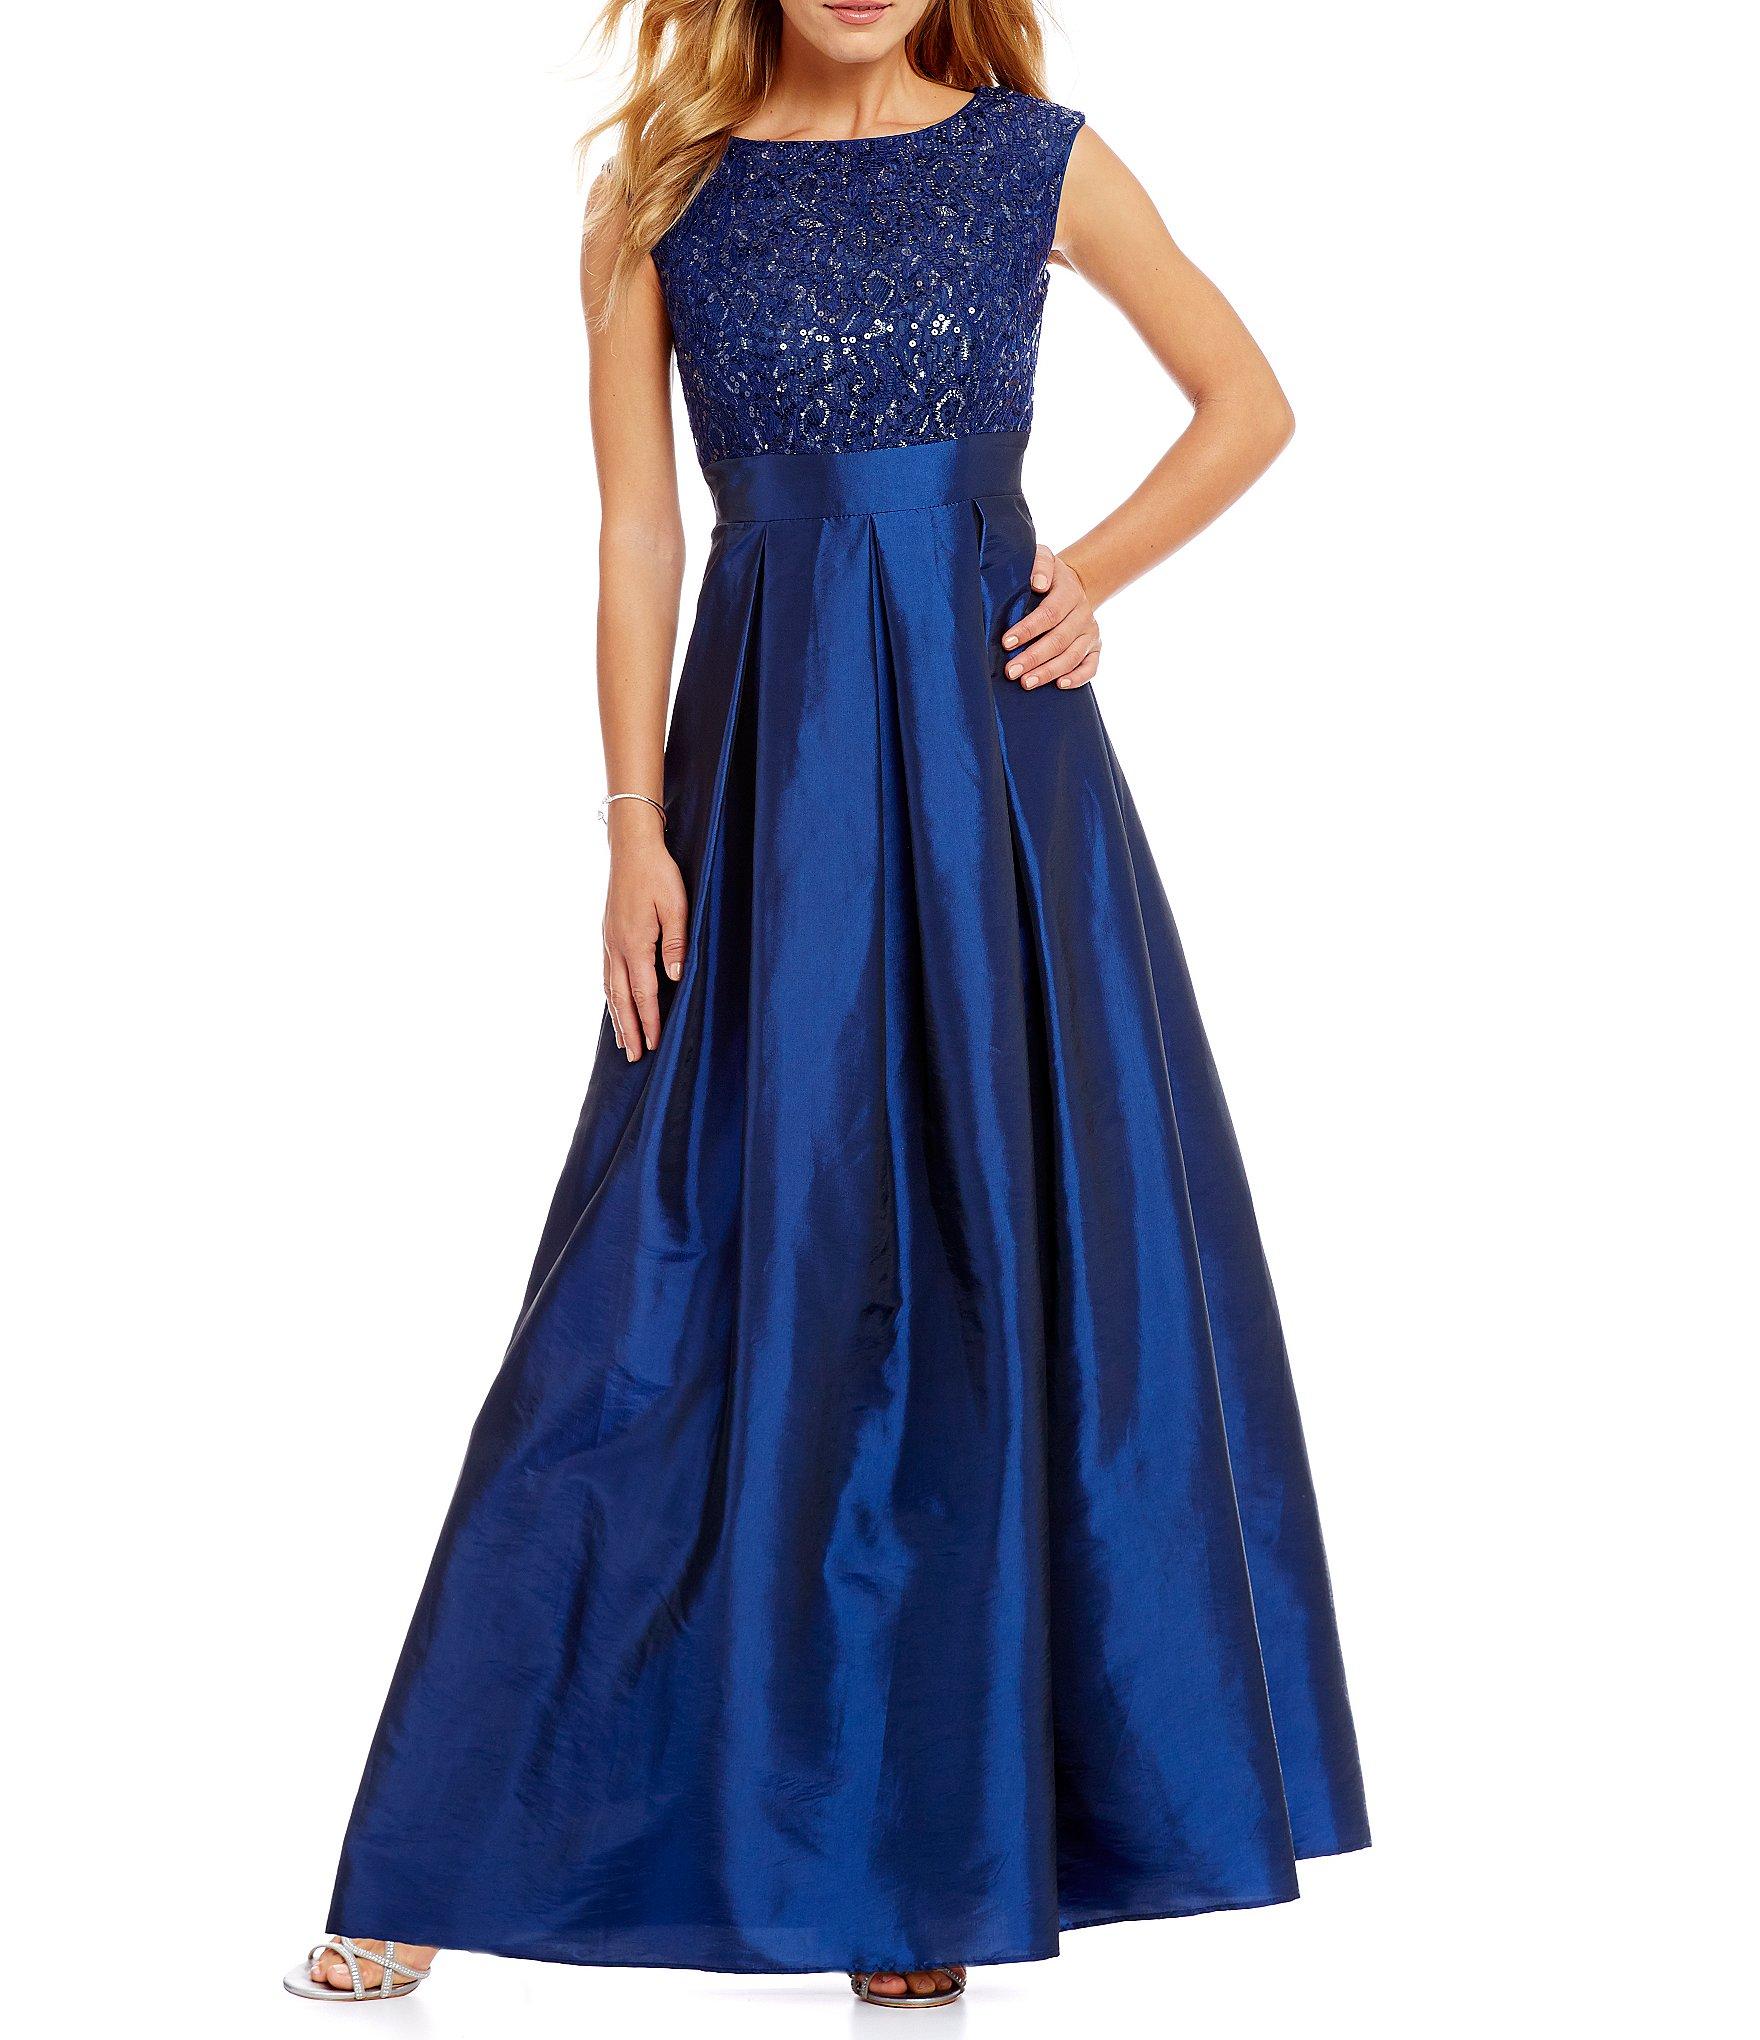 Inspirational Dillards Wedding Dresses Plus Size | Wedding